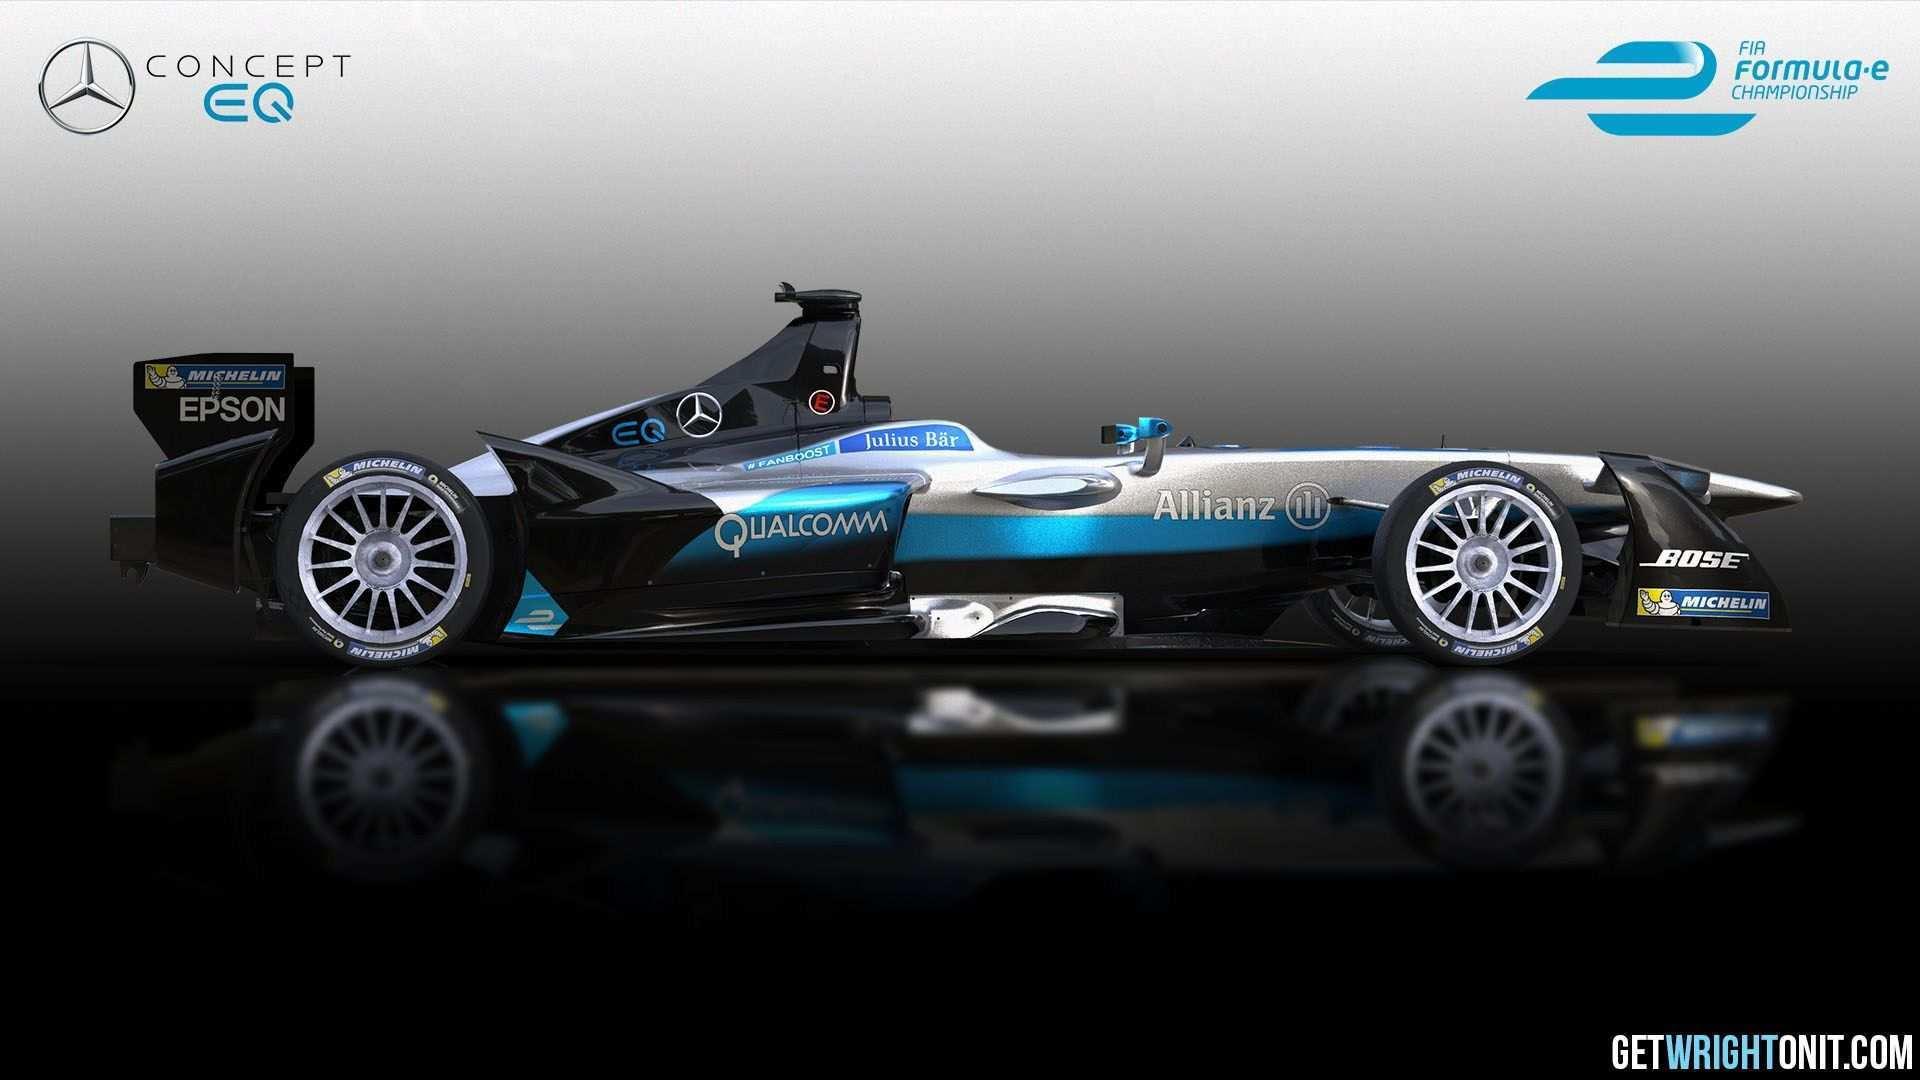 77 Concept of Mercedes Formula E 2019 Concept with Mercedes Formula E 2019